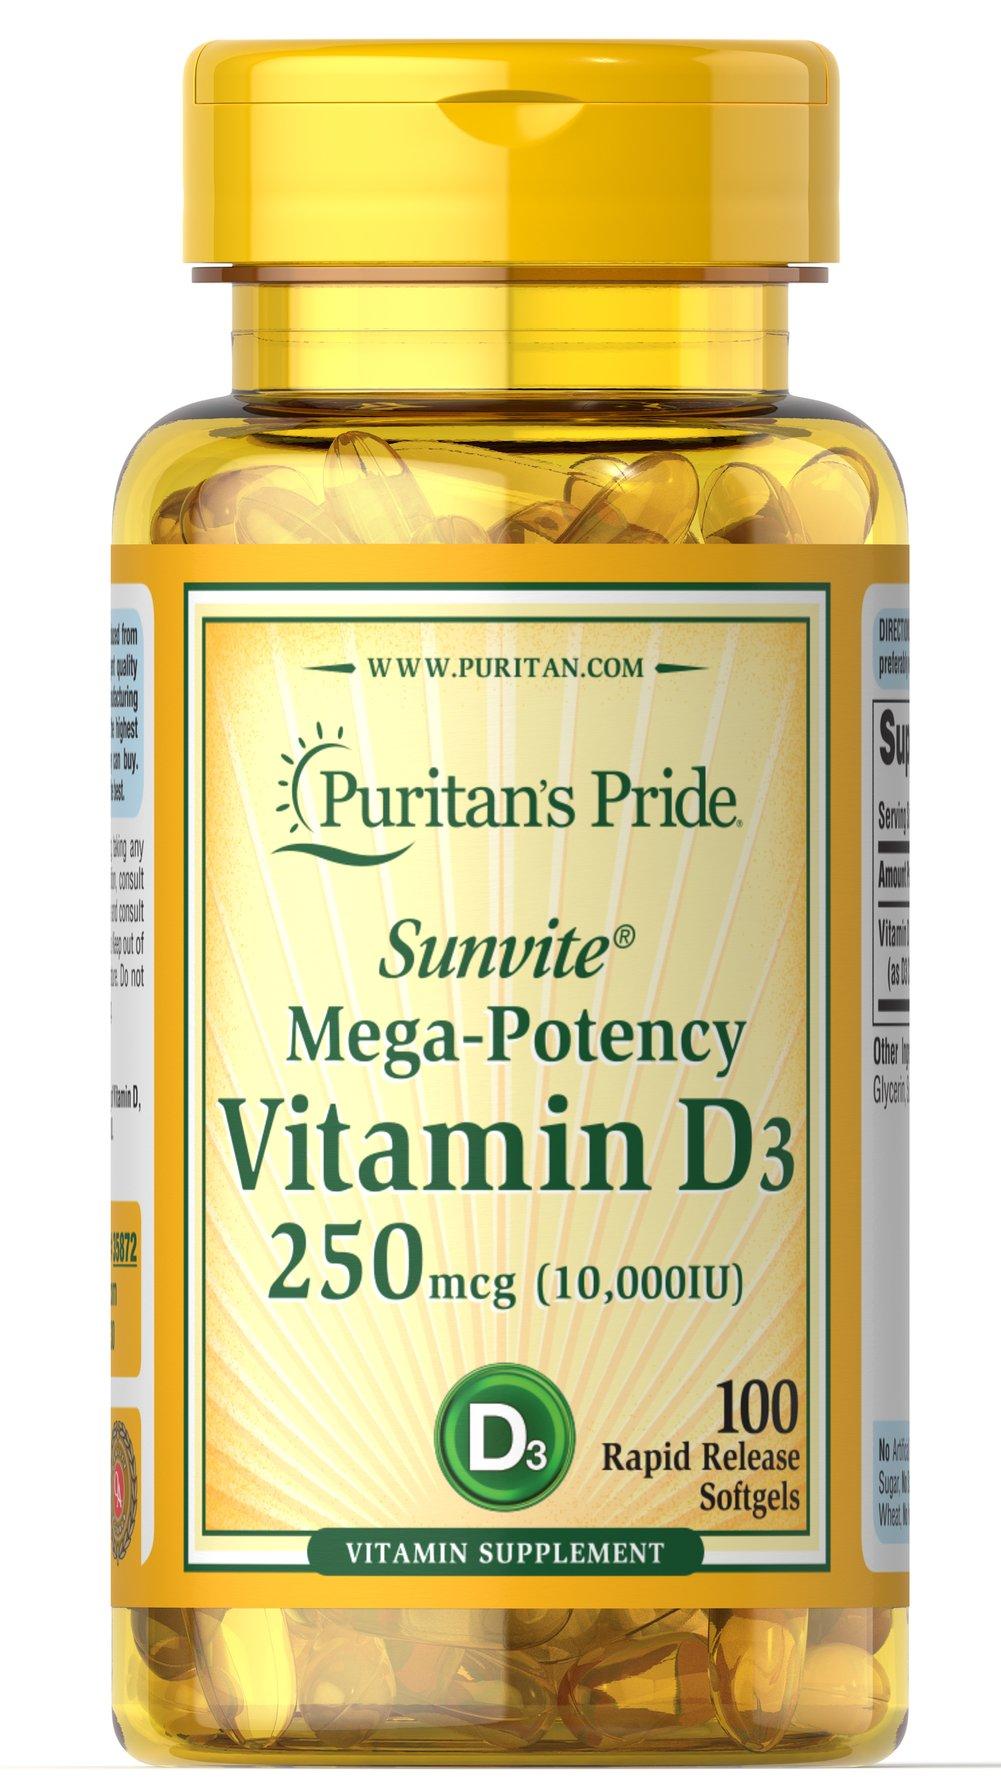 Vitamina D3 Puritan Pride - 10,000 UI